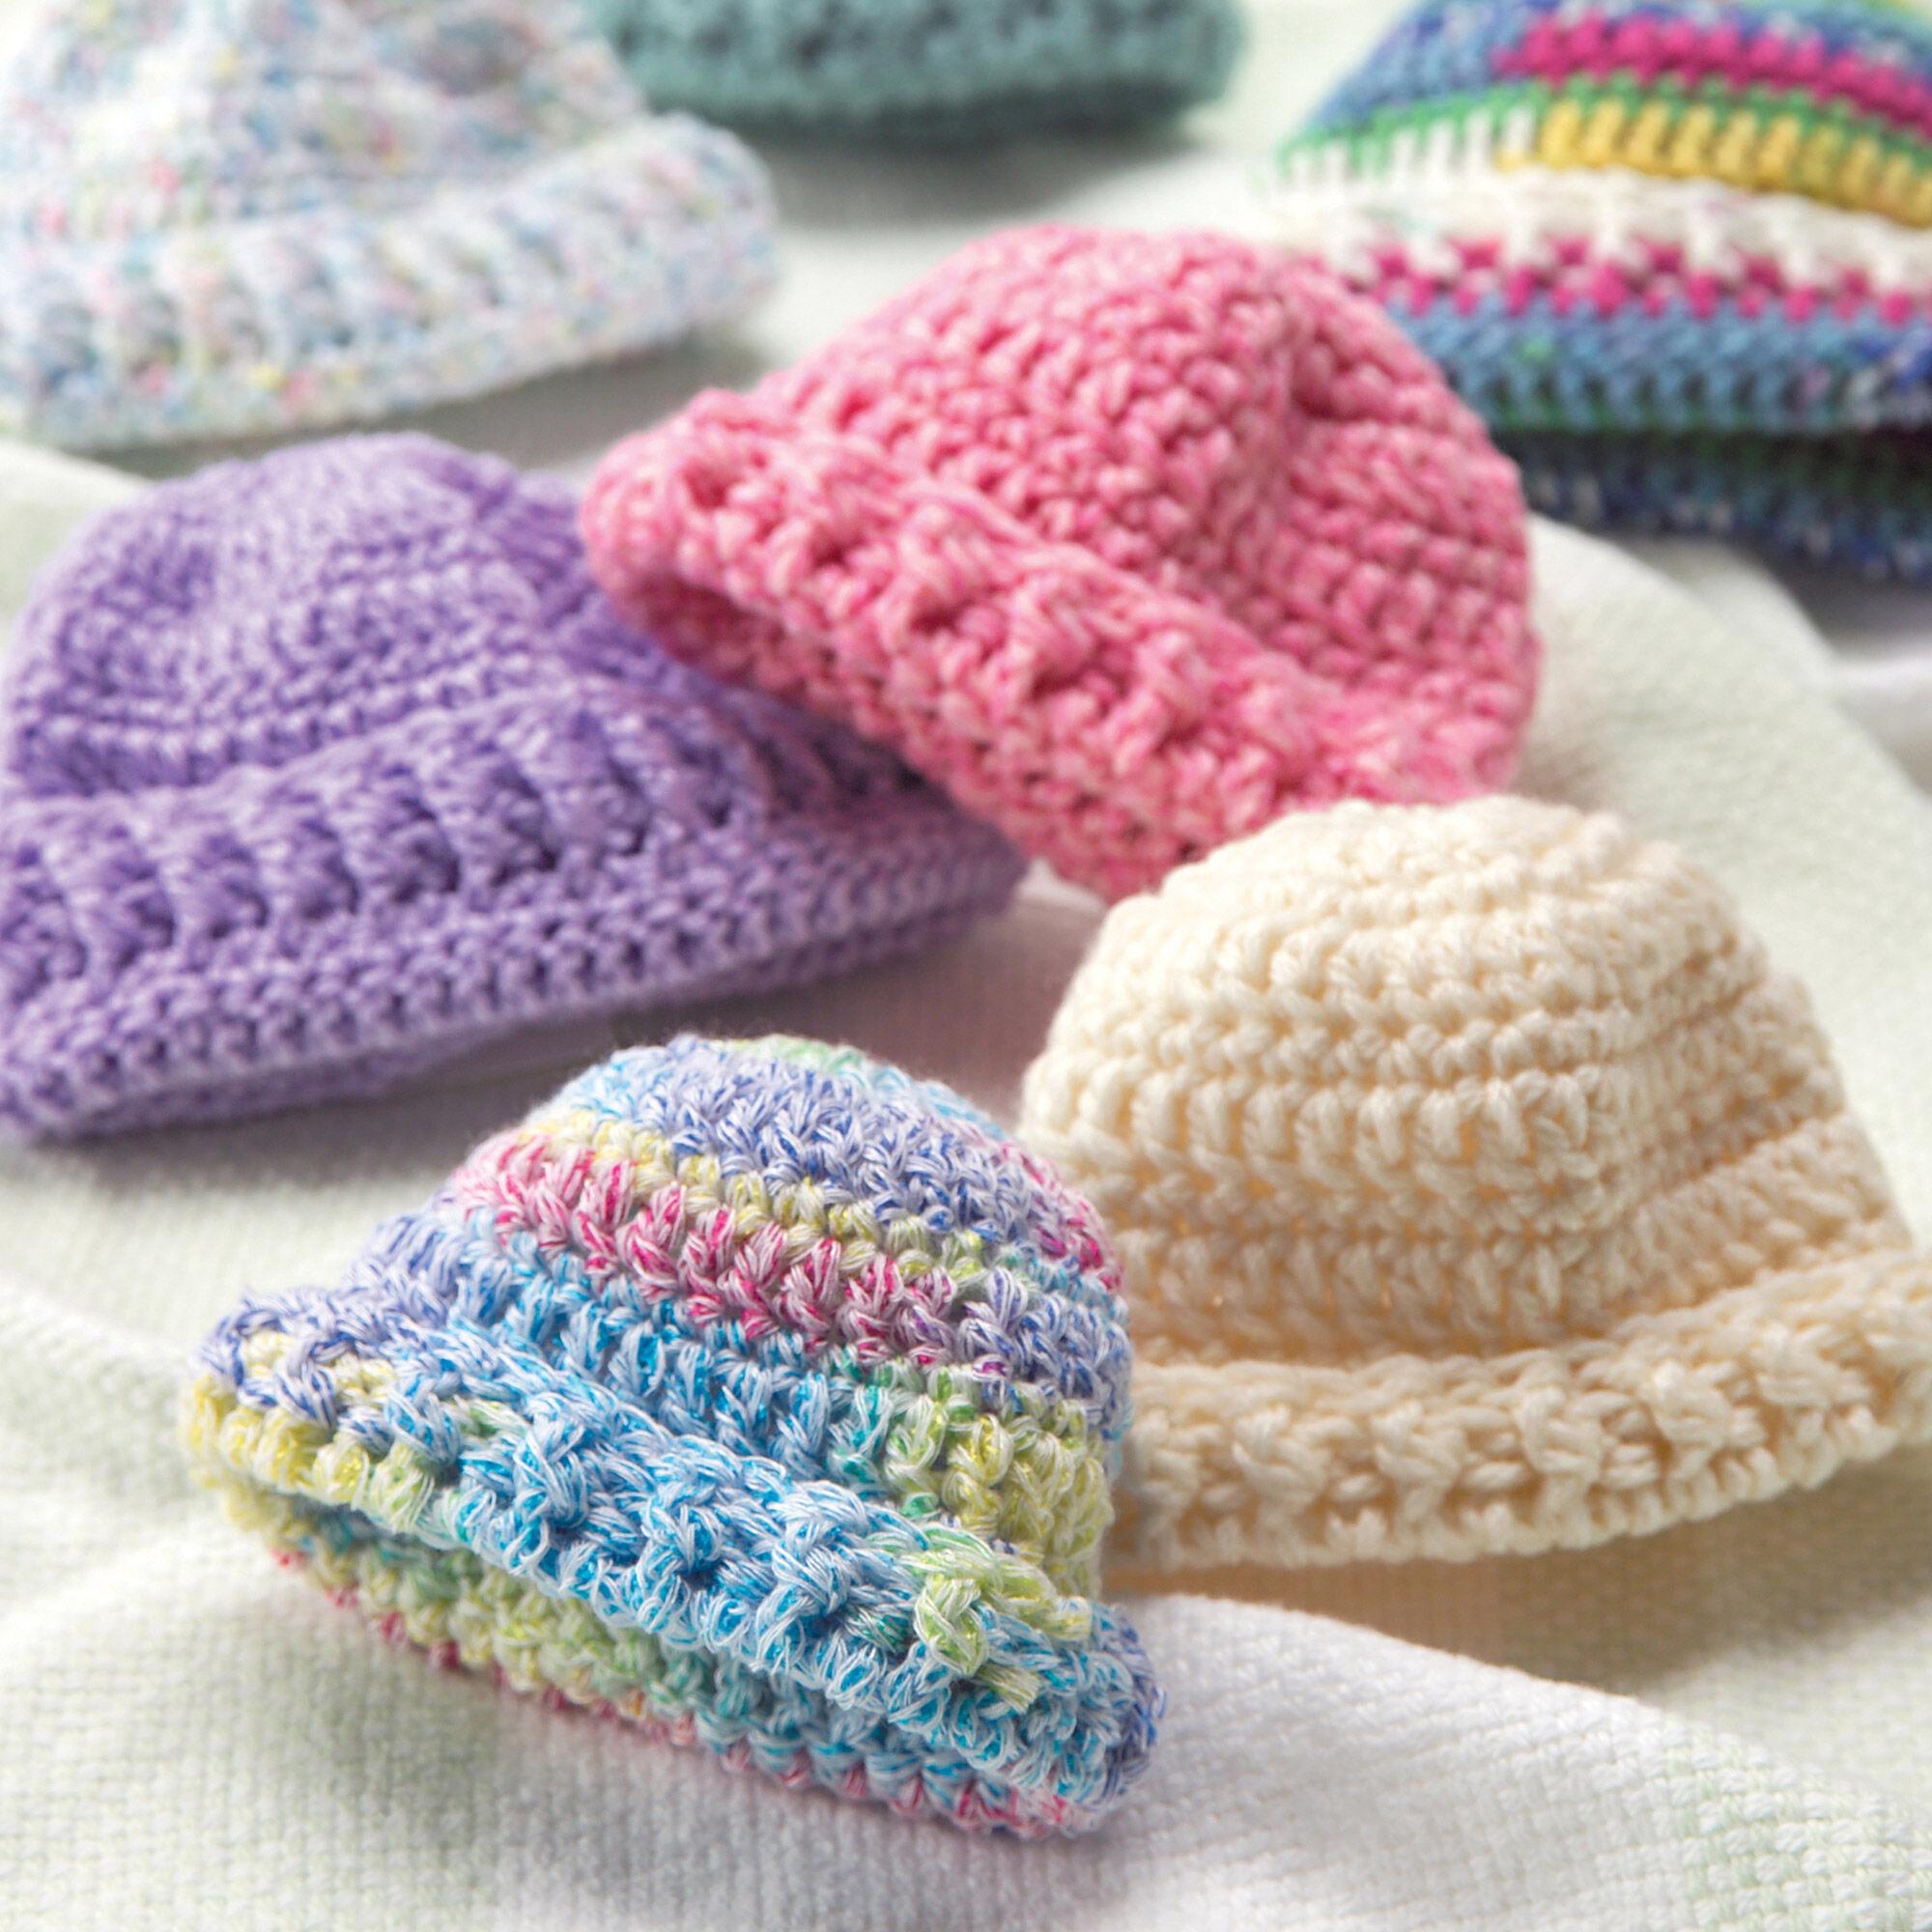 photos dainty scallop infant hat baby gift newborn baby hat made on order crochet baby hat pink ruffle baby hat Newborn hat